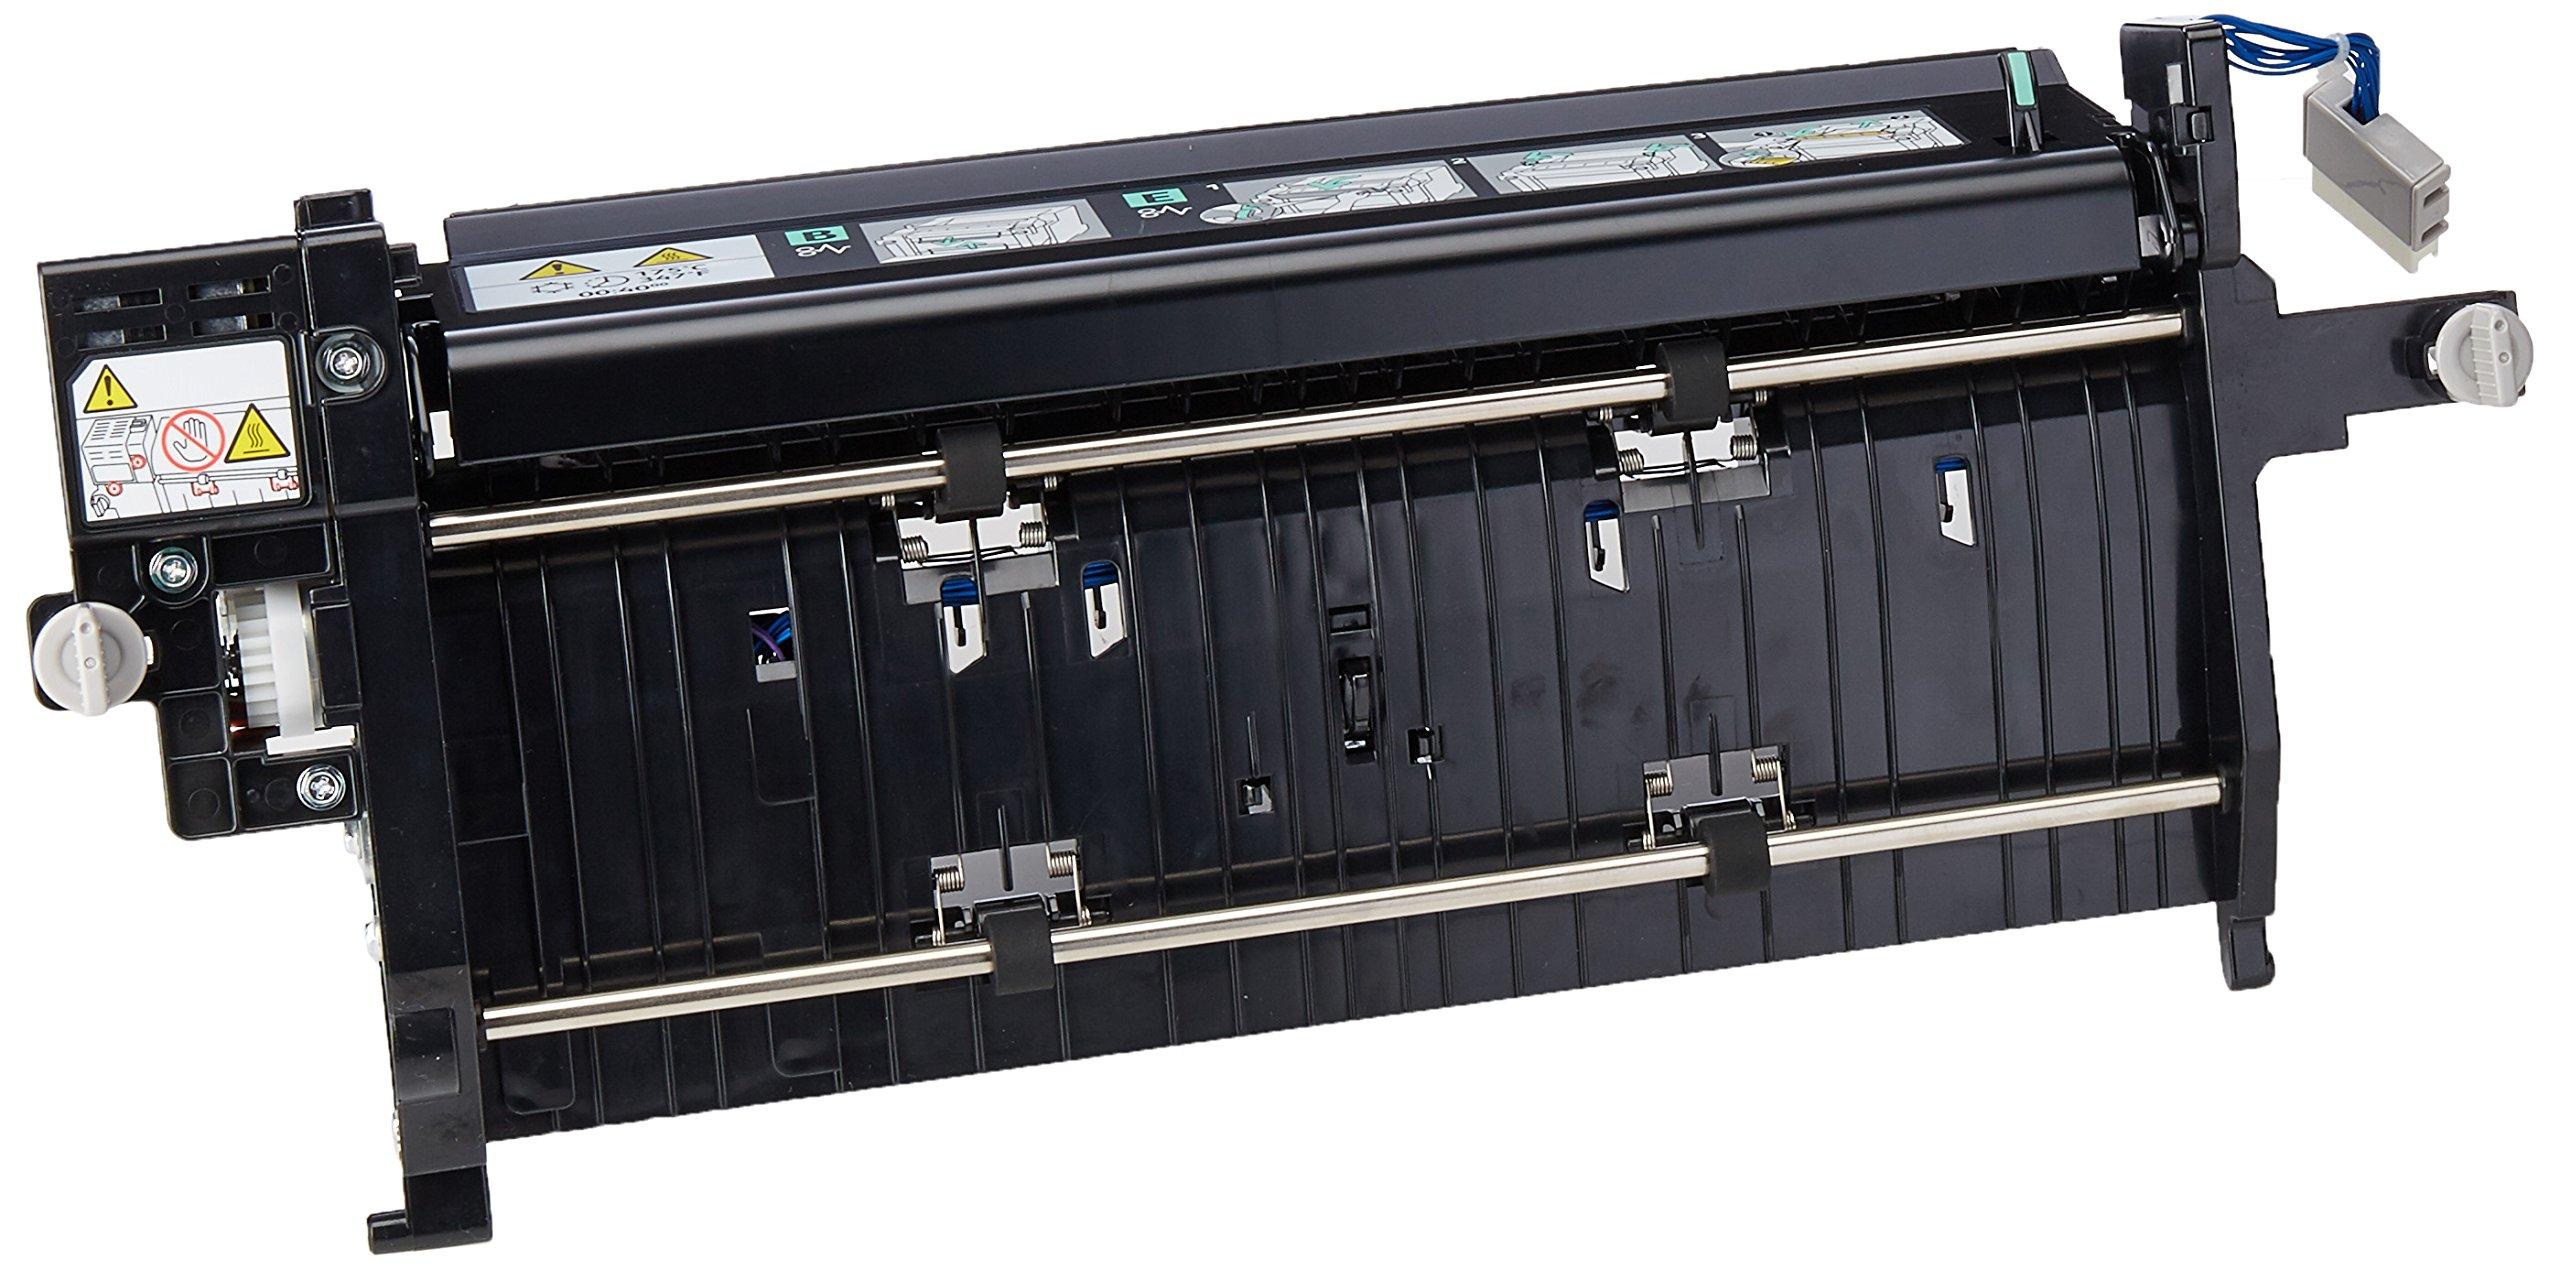 XER097S04486 - Xerox Phaser 7100 Duplex Unit by Xerox